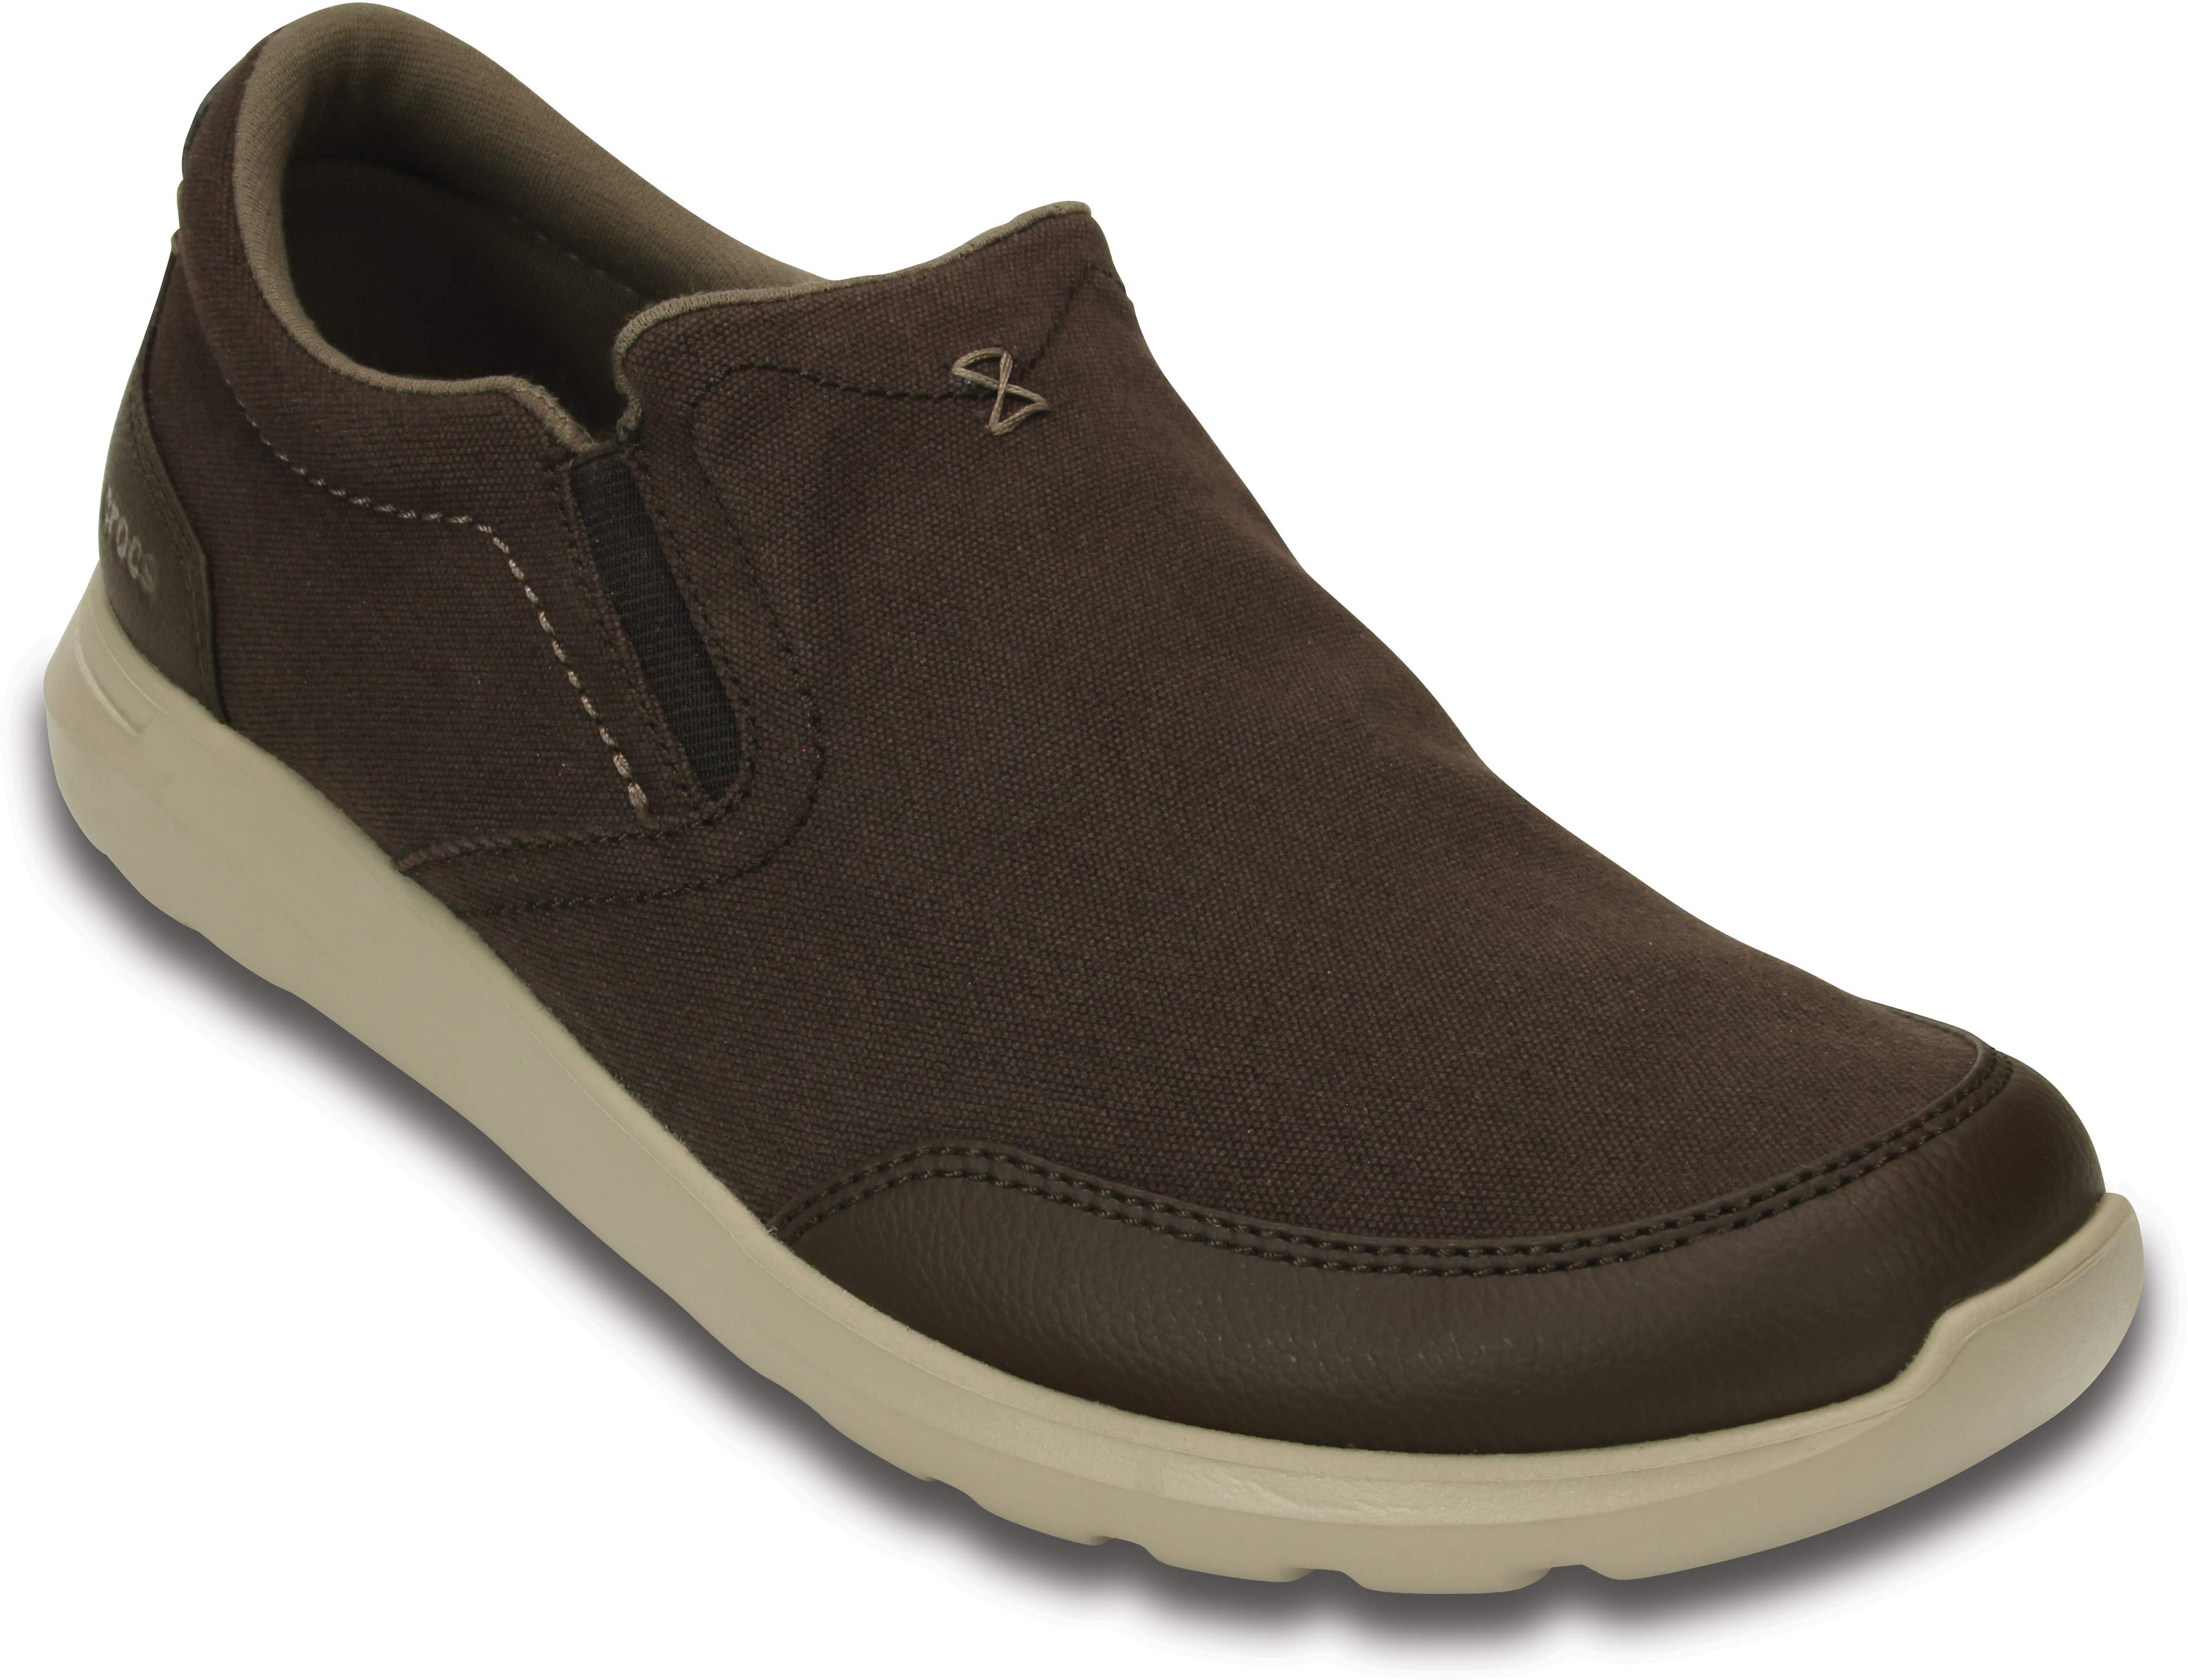 Crocs Kinsale Slip-on Mens Shoe (Multiple Colors)